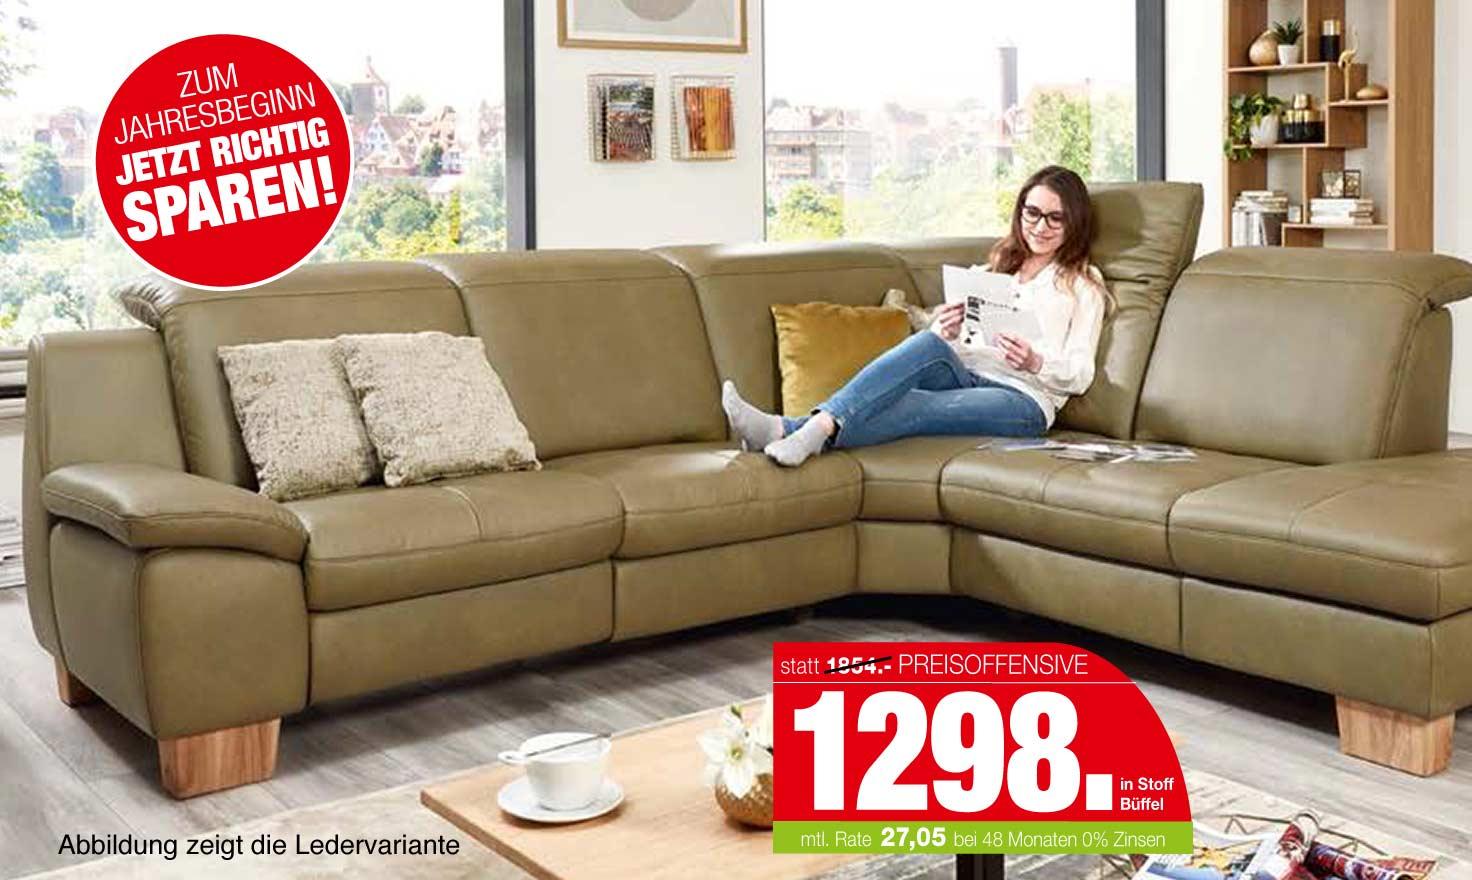 Viel Sofa, kleiner Preis